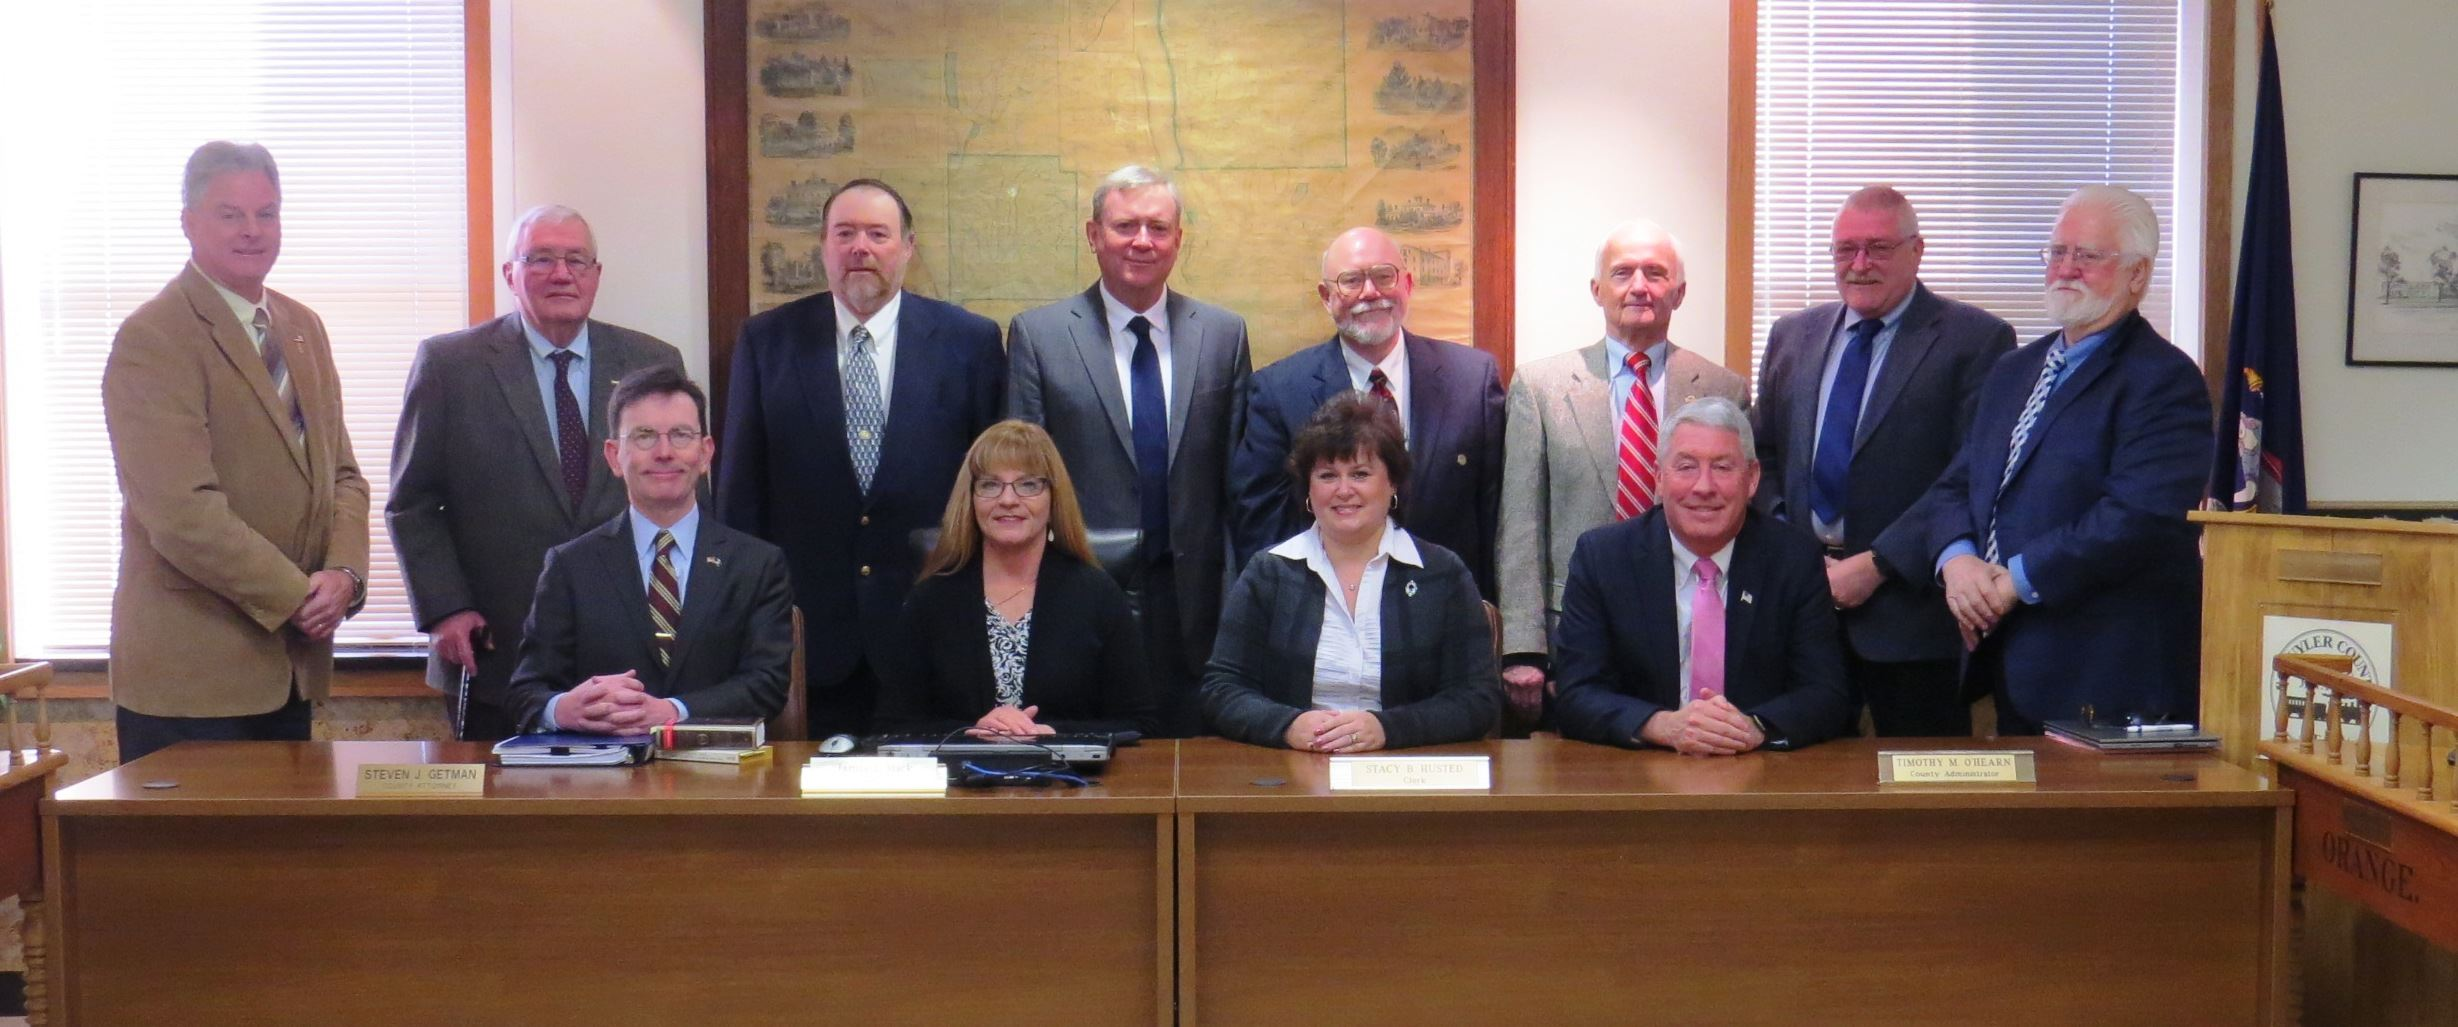 Schuyler Legislature Approves County Employee Dress Code